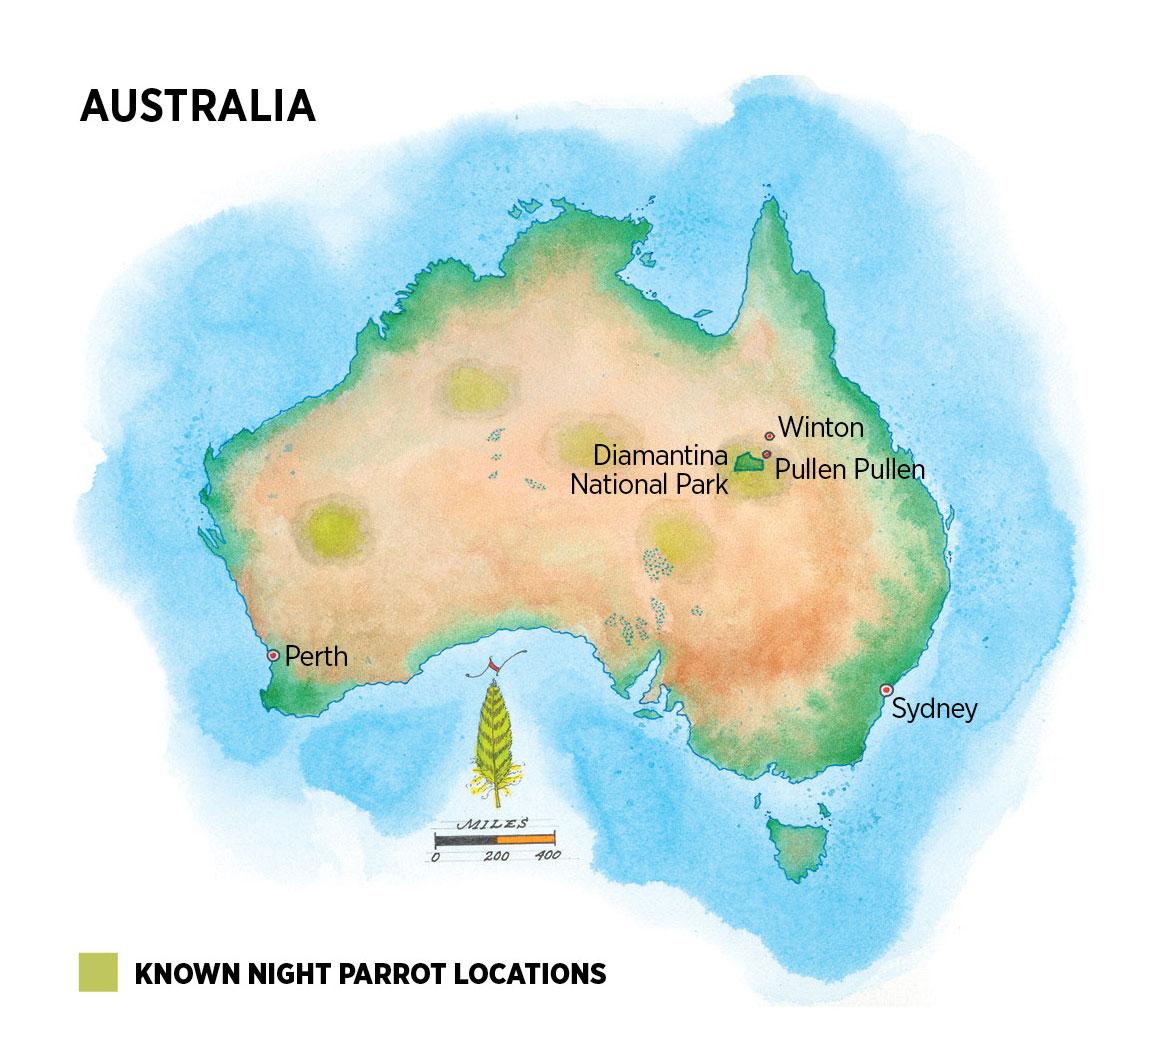 Map by Mike Regan